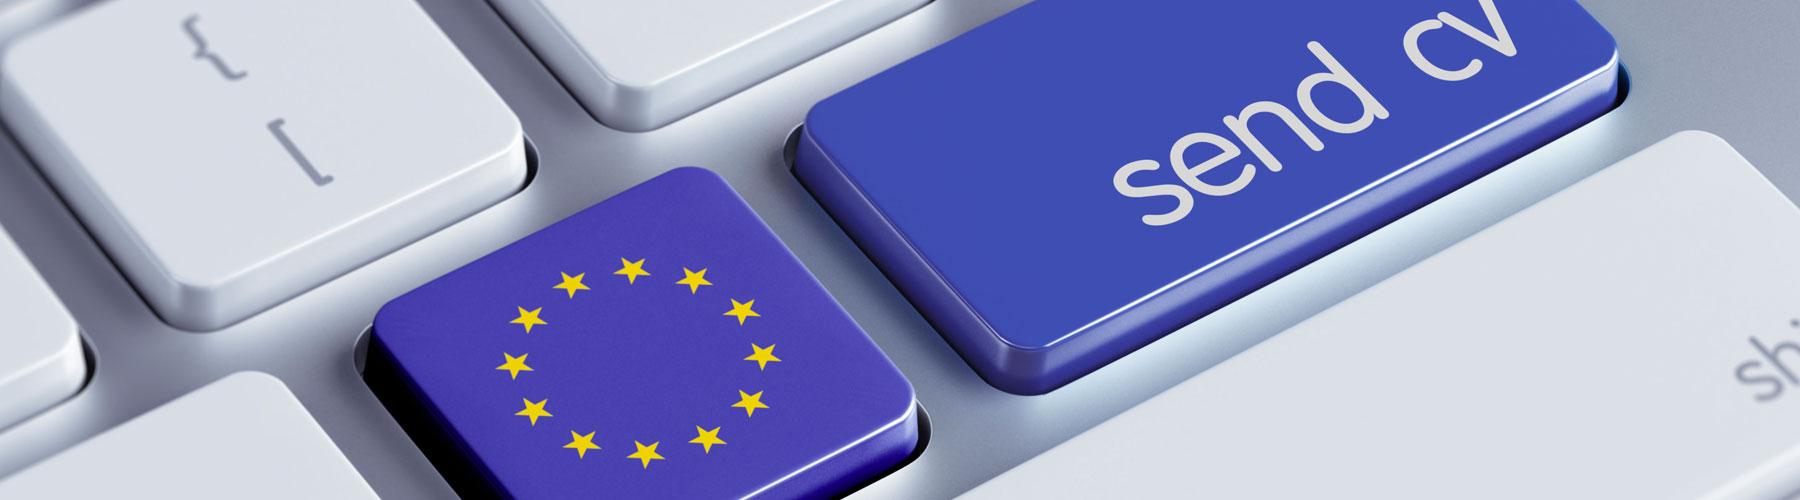 Curriculum Vitae Europeo Cos ¨ E E Pilarlo FourStars Blog